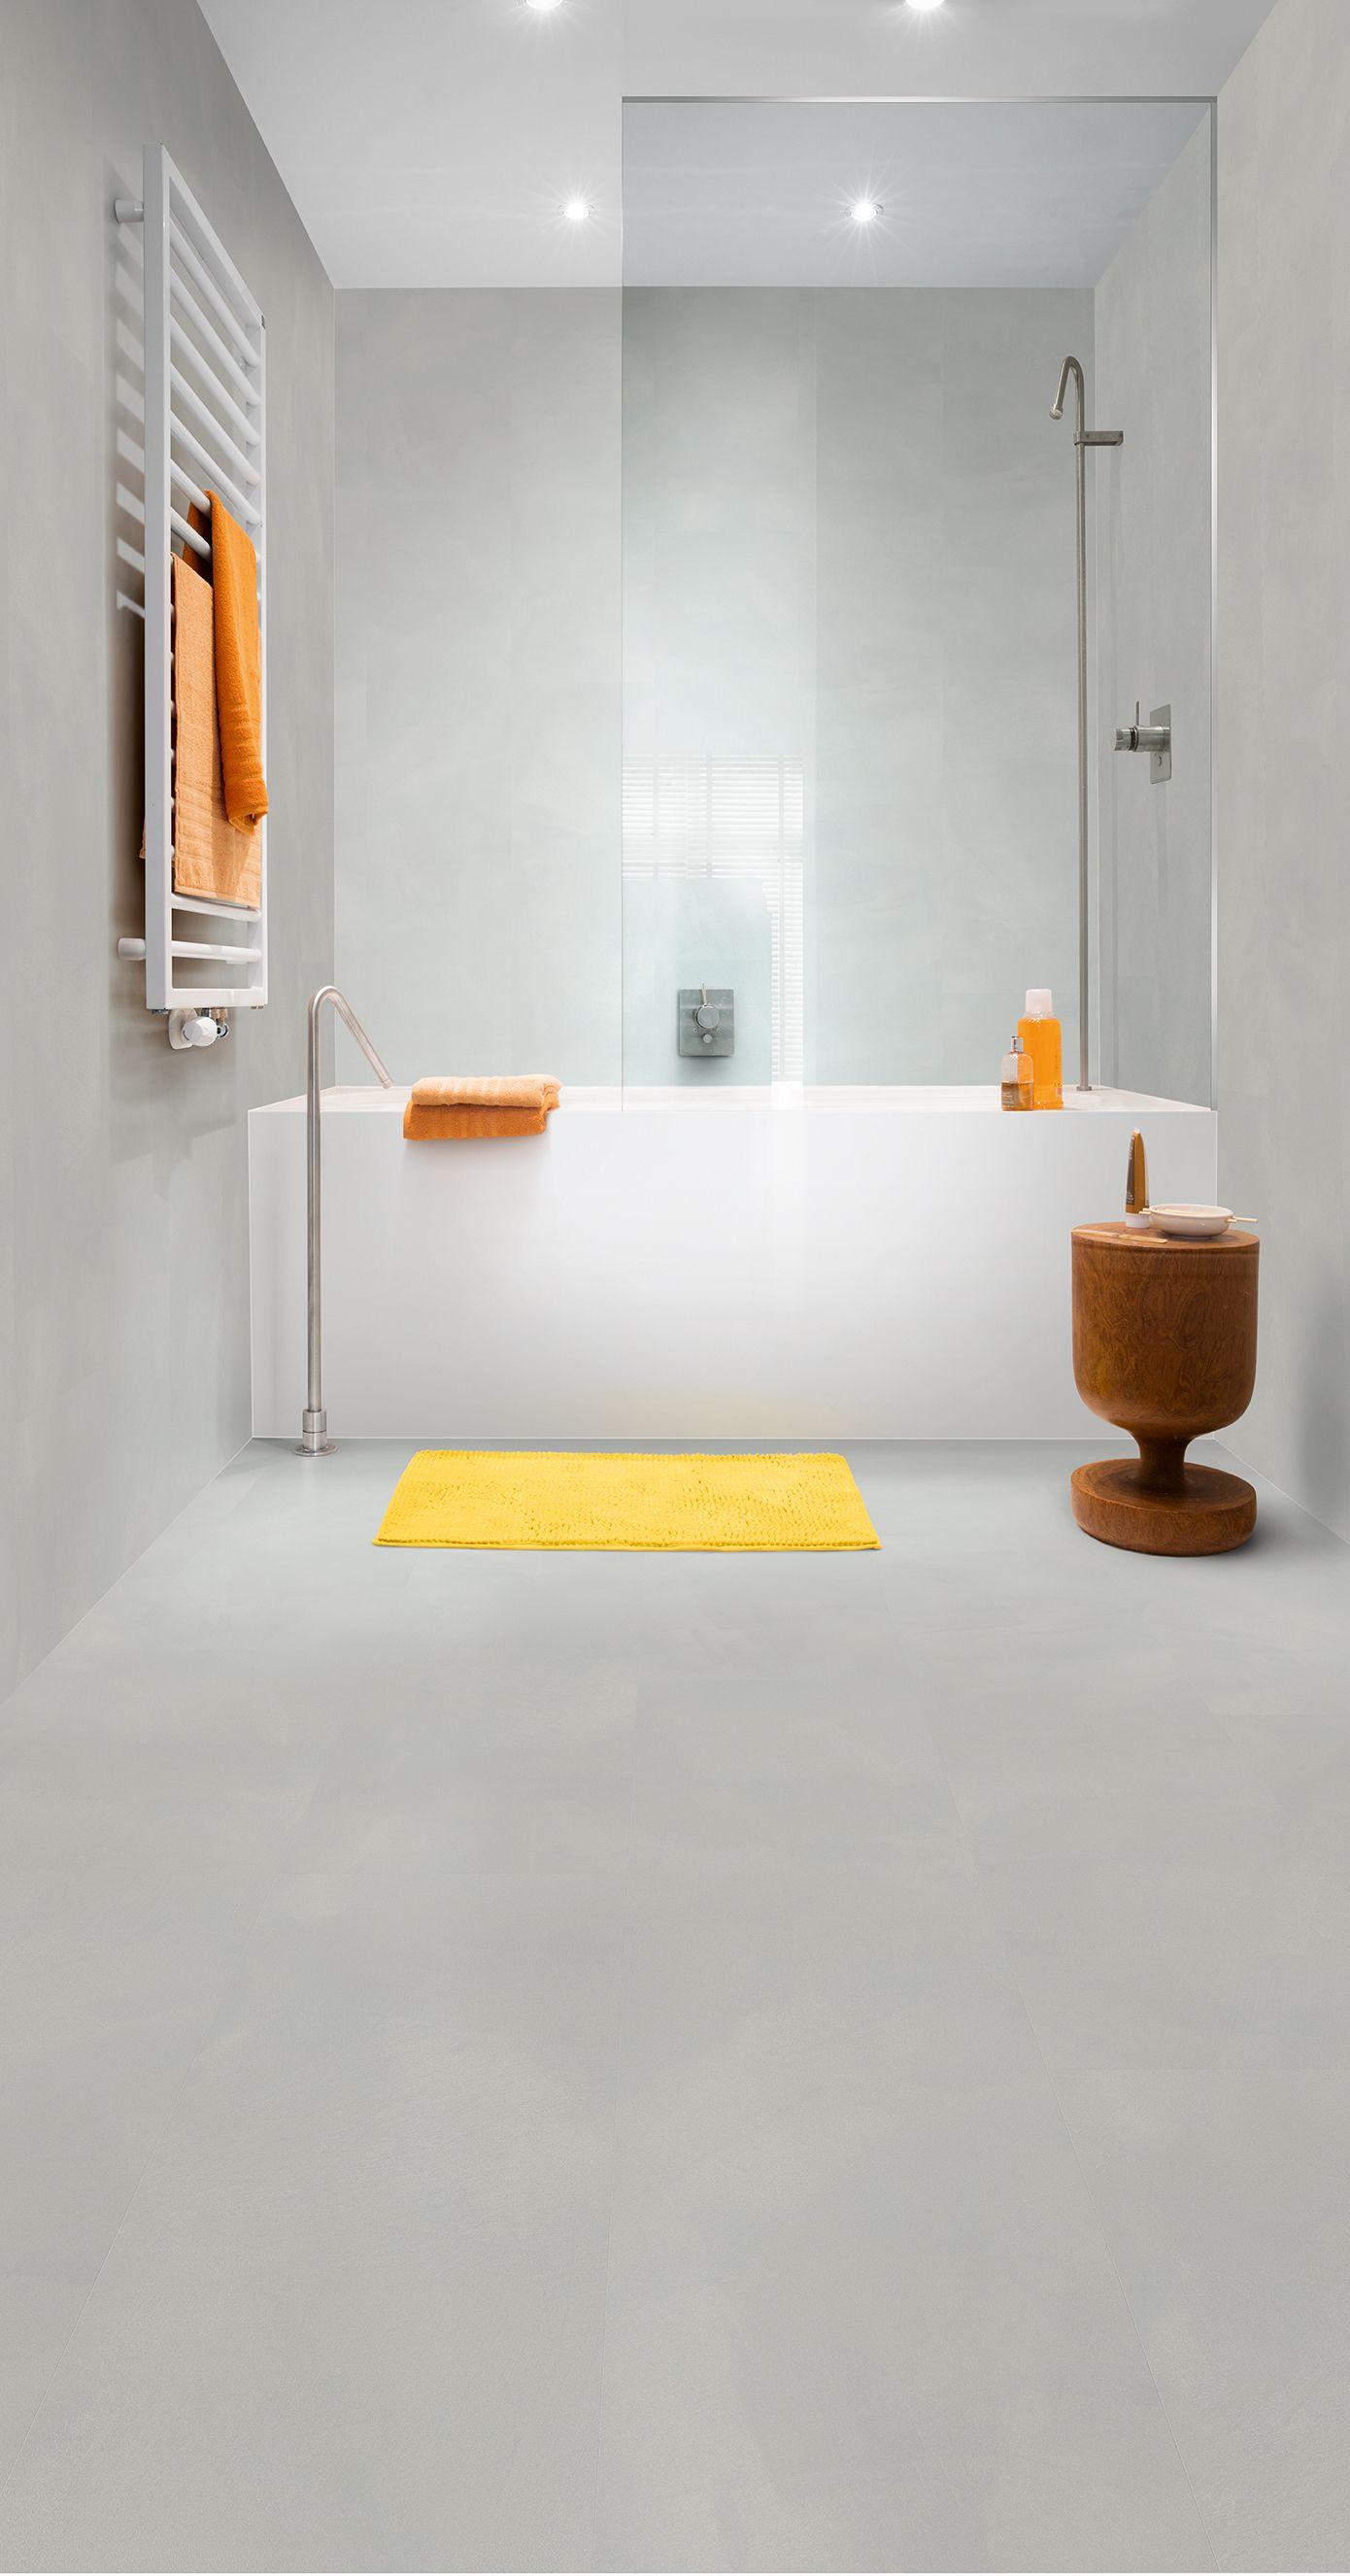 Choose the perfect bathroom floor | Pinterest | Bathroom inspiration ...